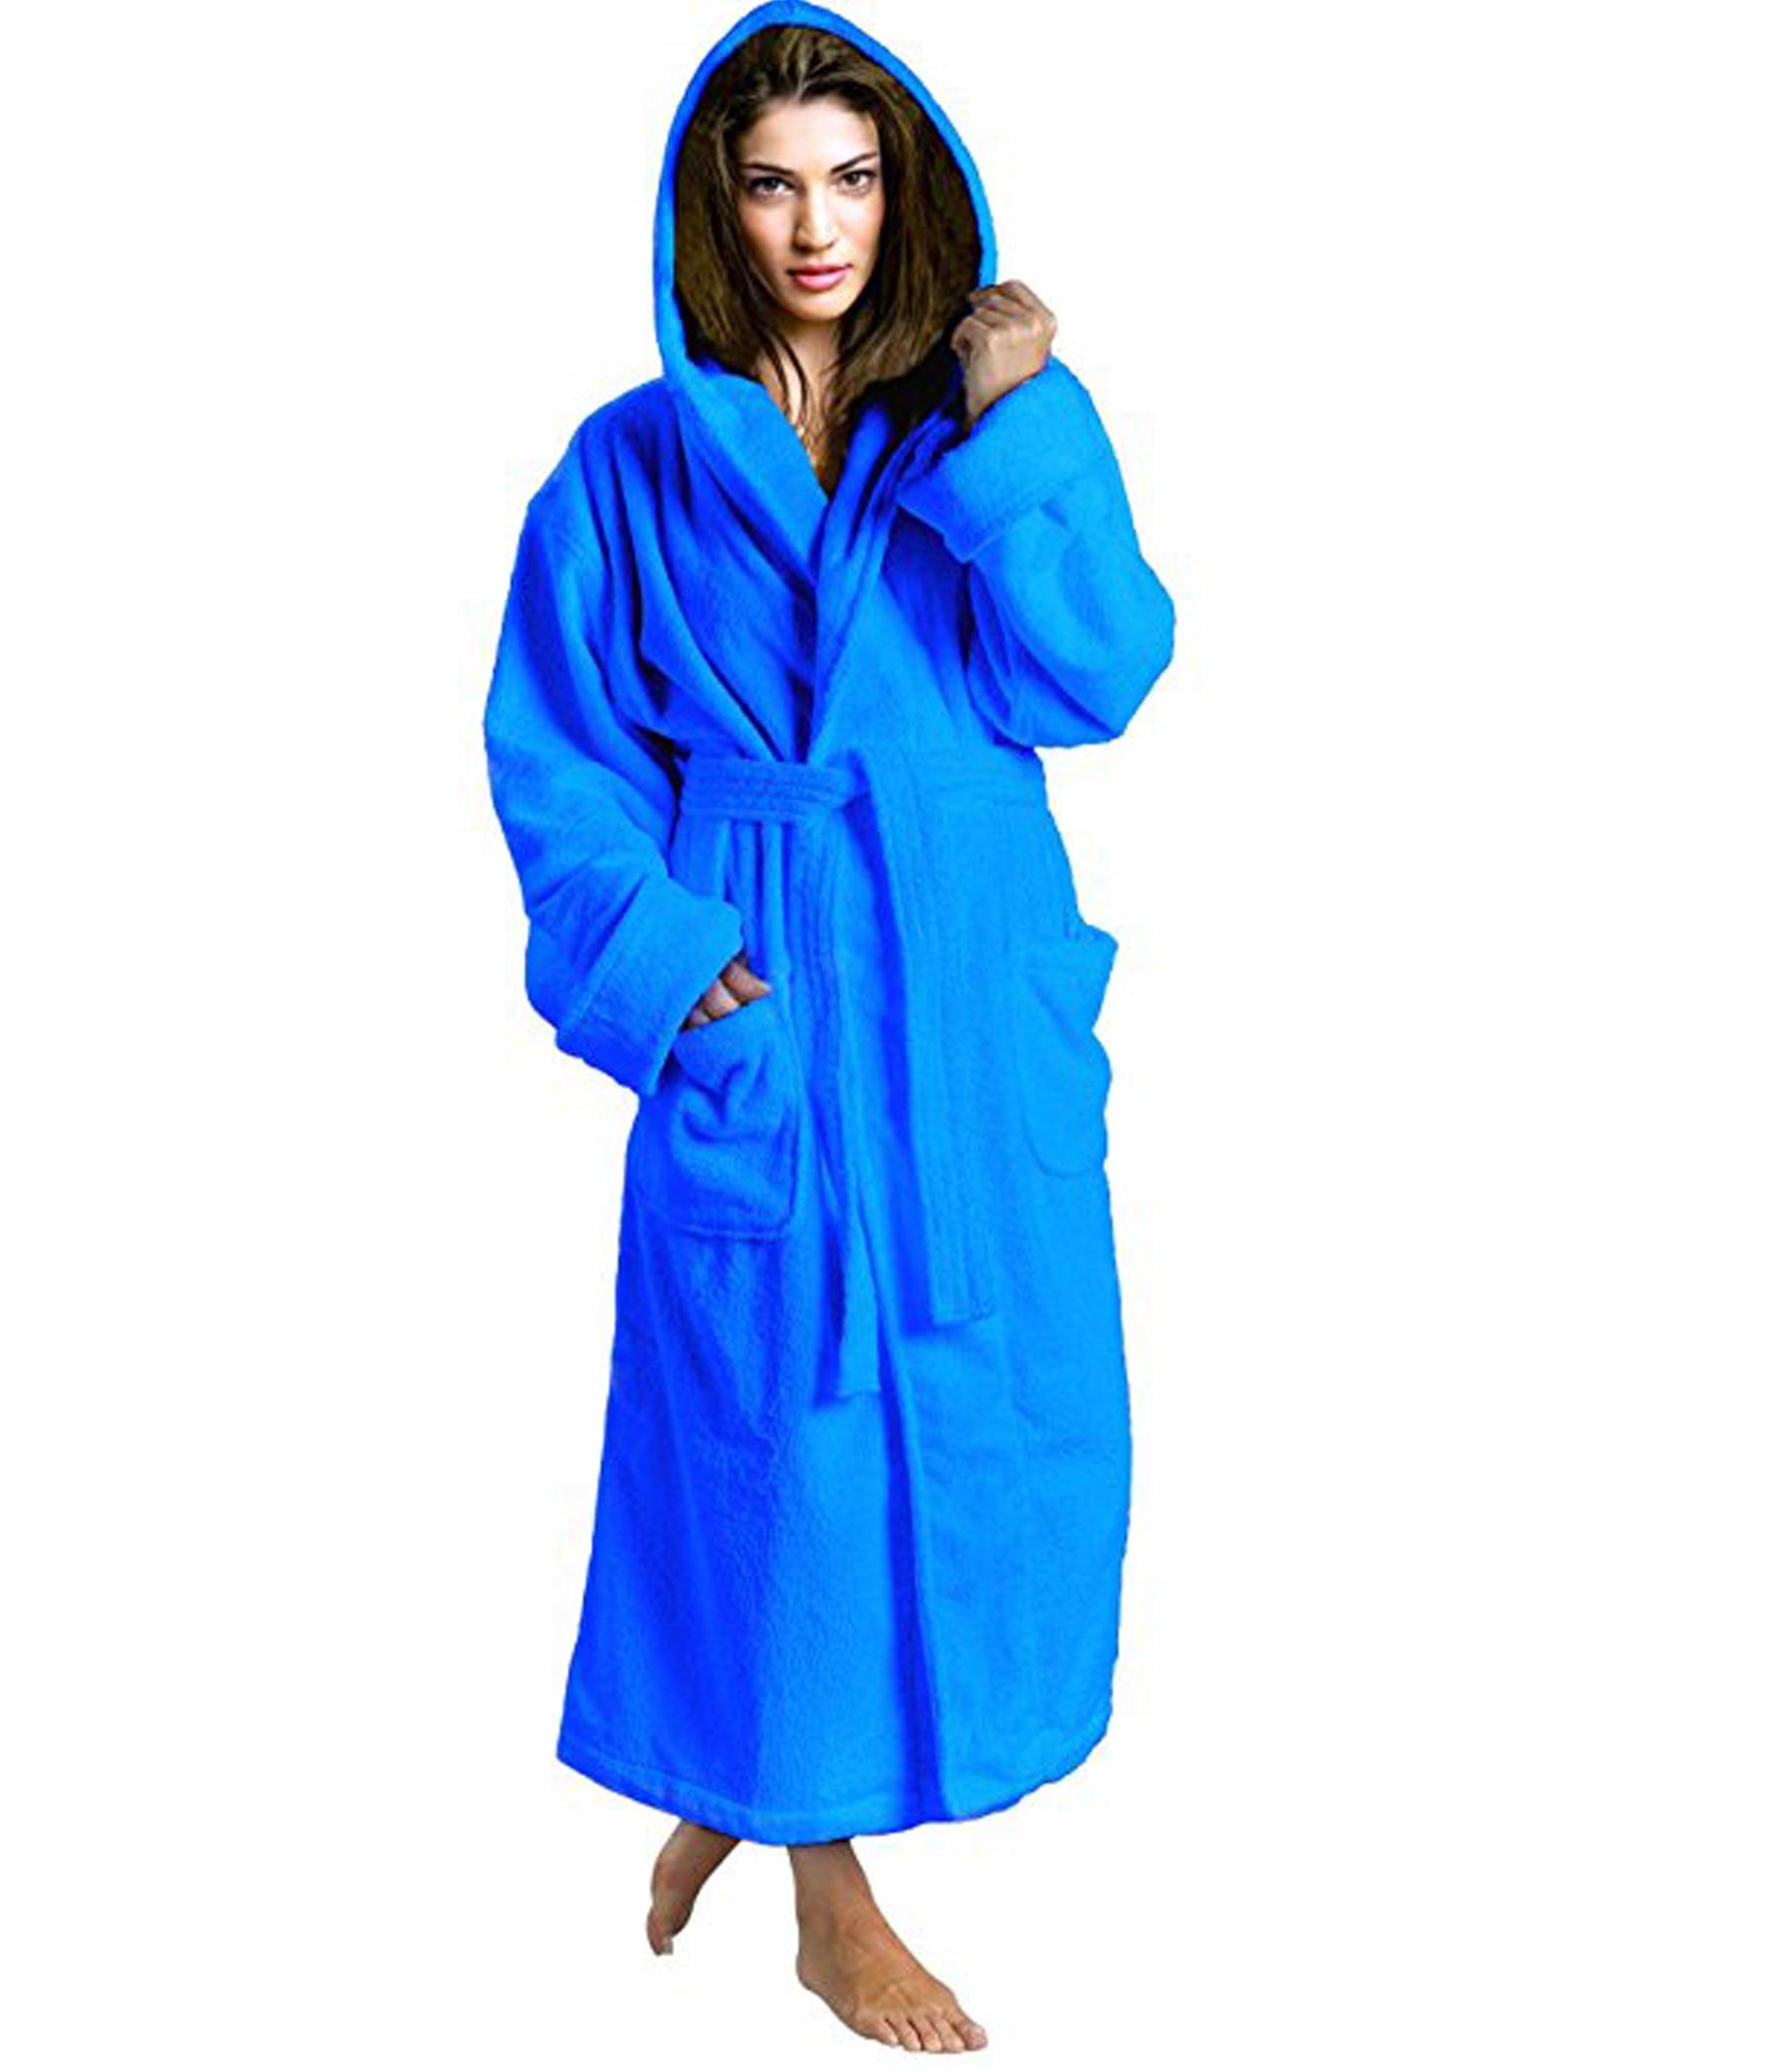 Skylinewears - Women s Toweling Robe 100% Terry Cotton Hooded Bathrobe -  Walmart.com 8fe2a5e97